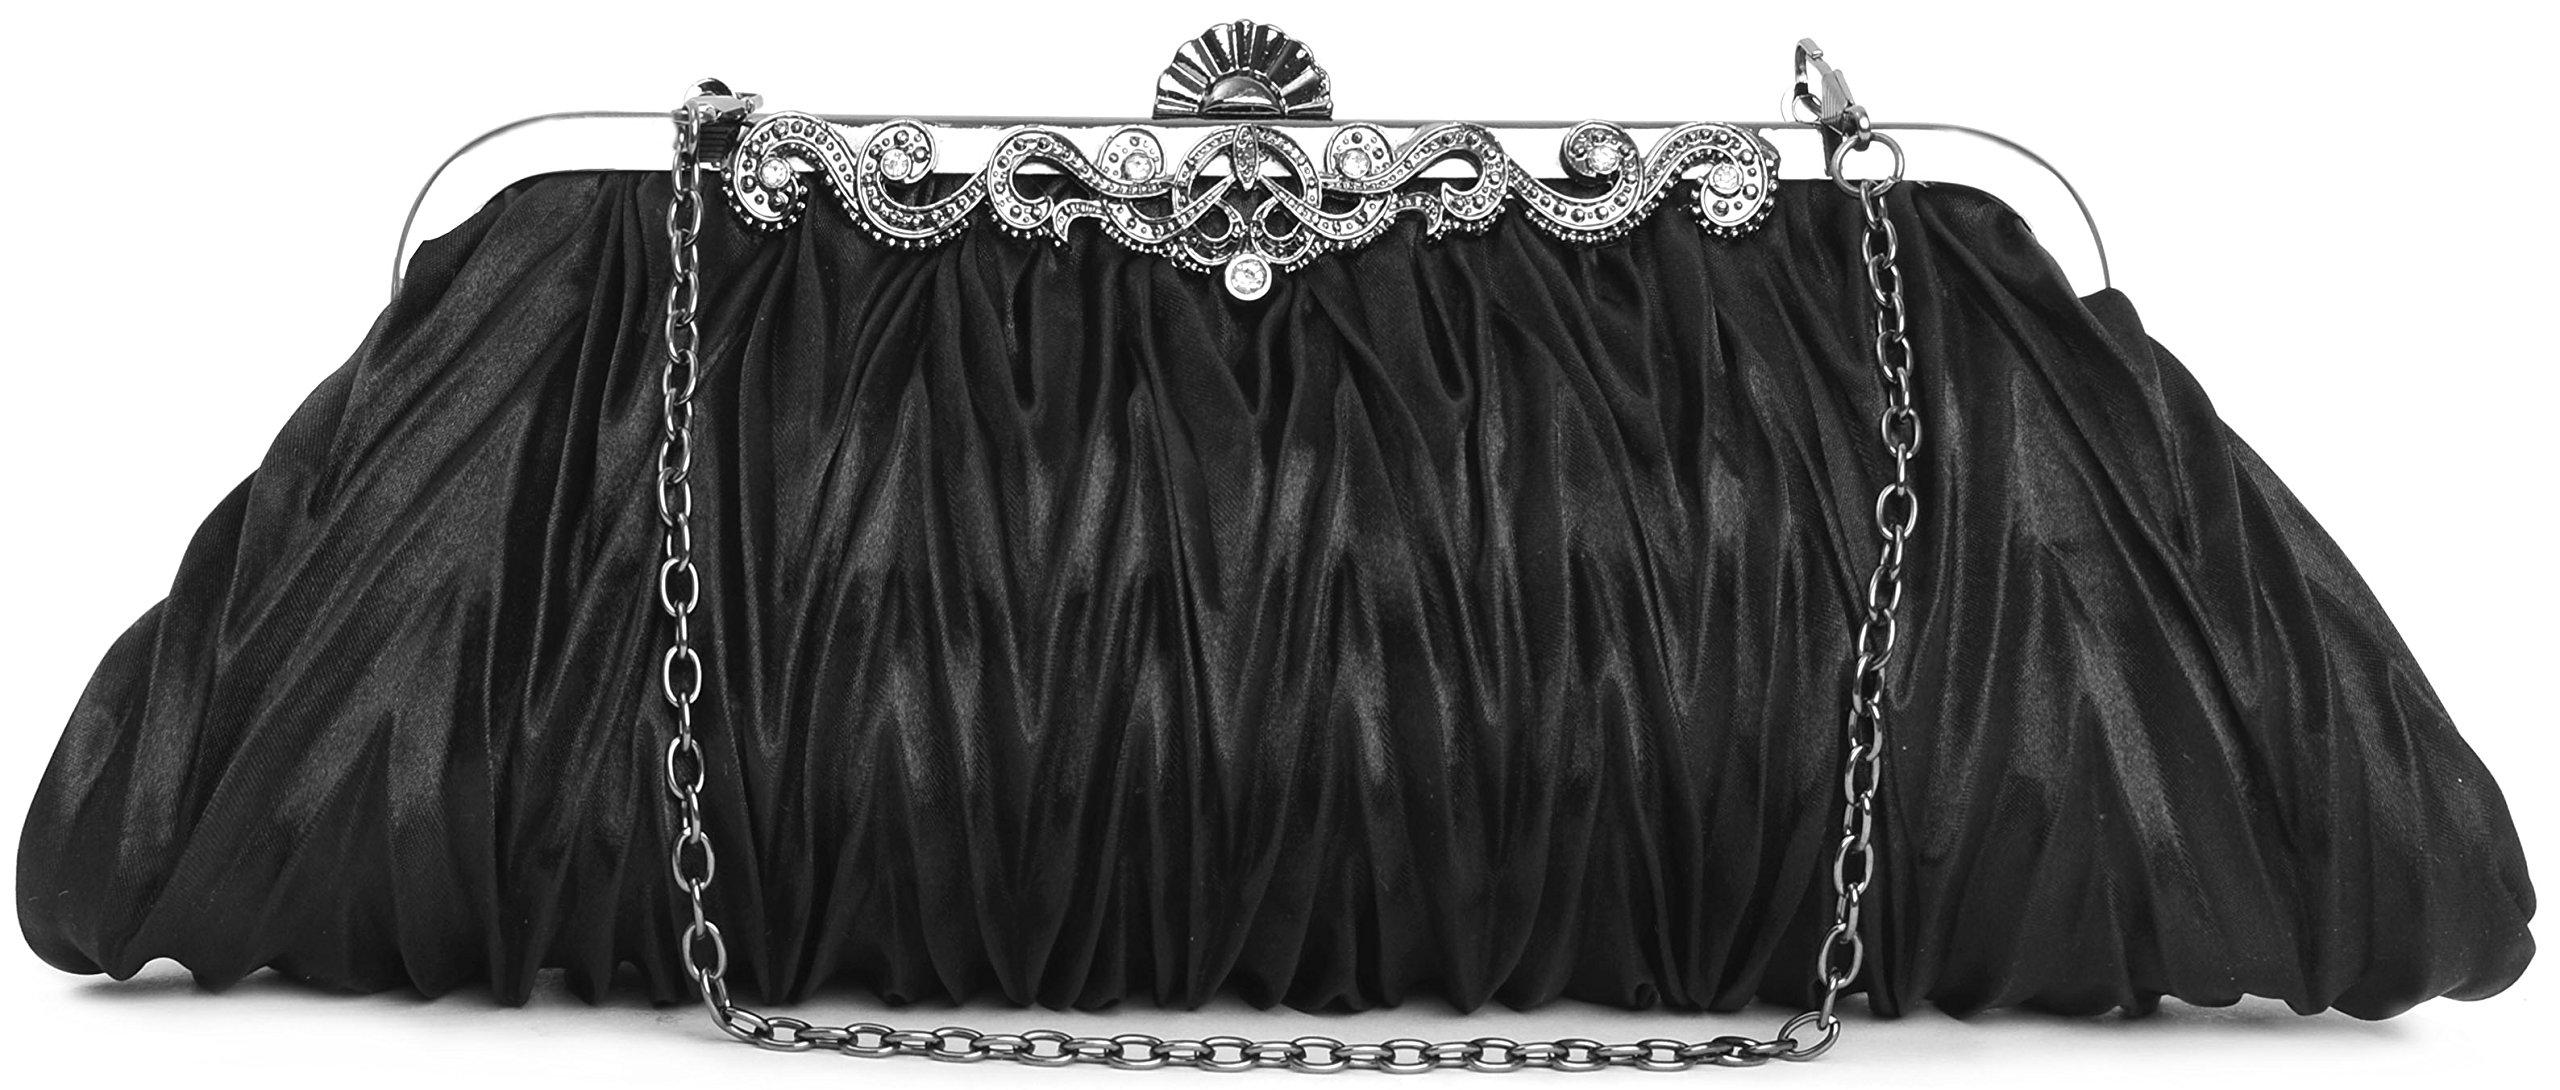 Pulama 1920s Crossbody Bag for Women, Vintage Evening Clutch Purse Wallet, Black